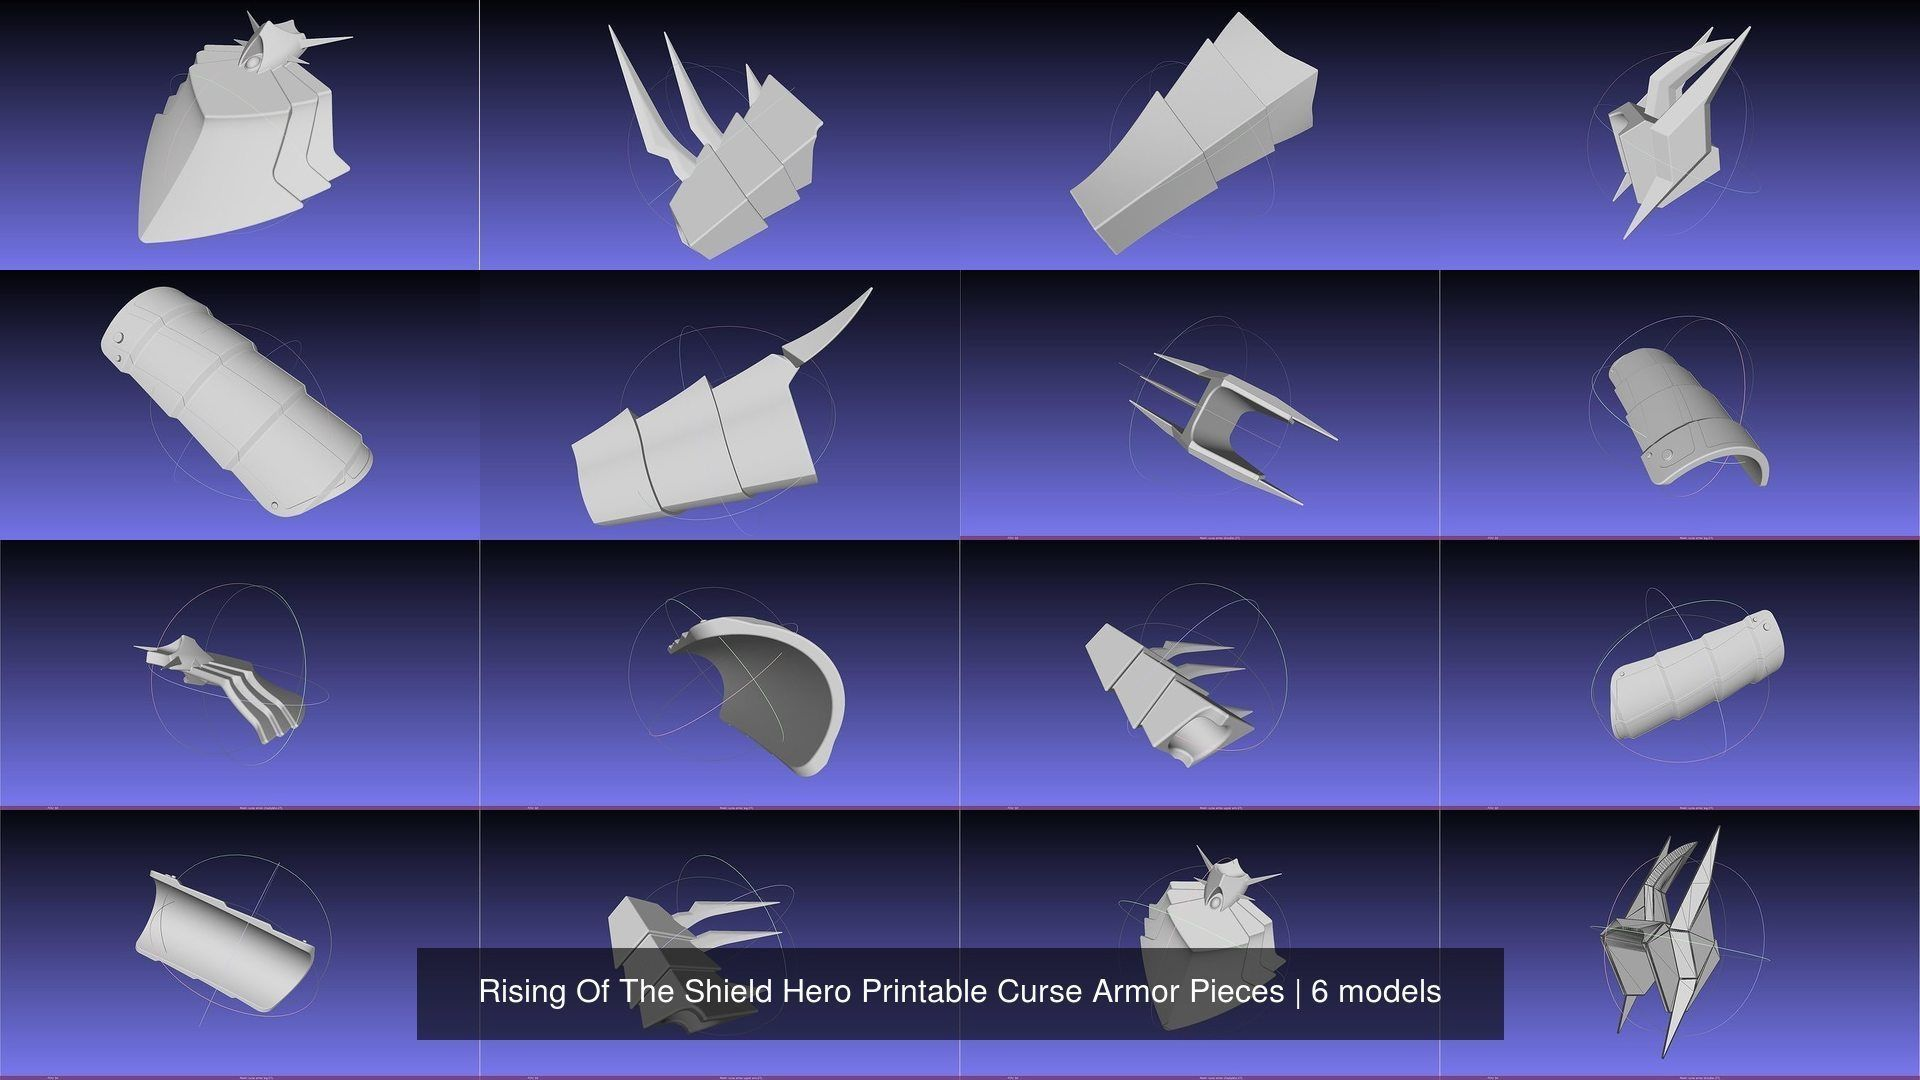 Rising Of The Shield Hero Printable Curse Armor Pieces